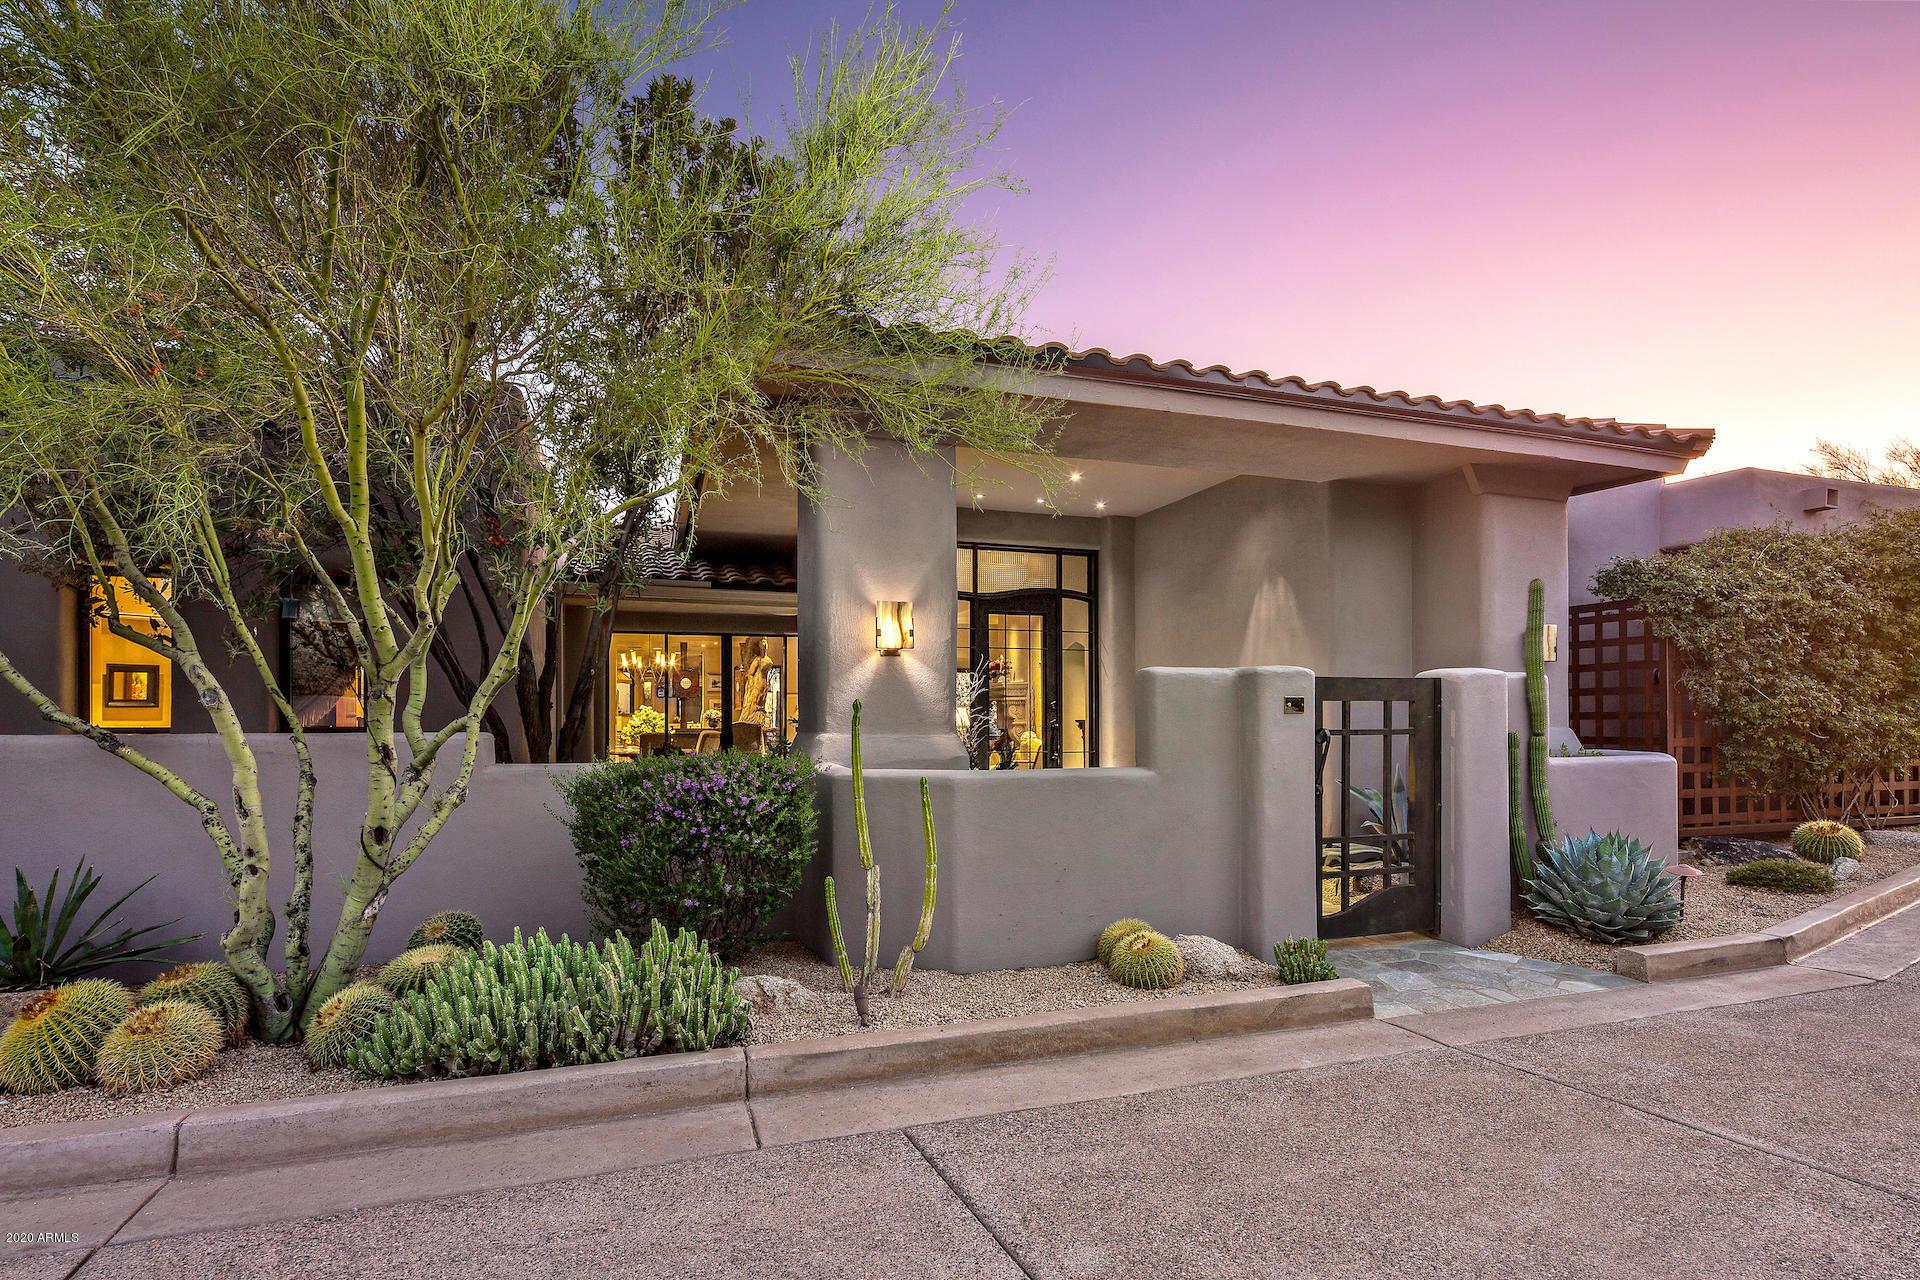 Photo of 39449 N 105th Street, Scottsdale, AZ 85262